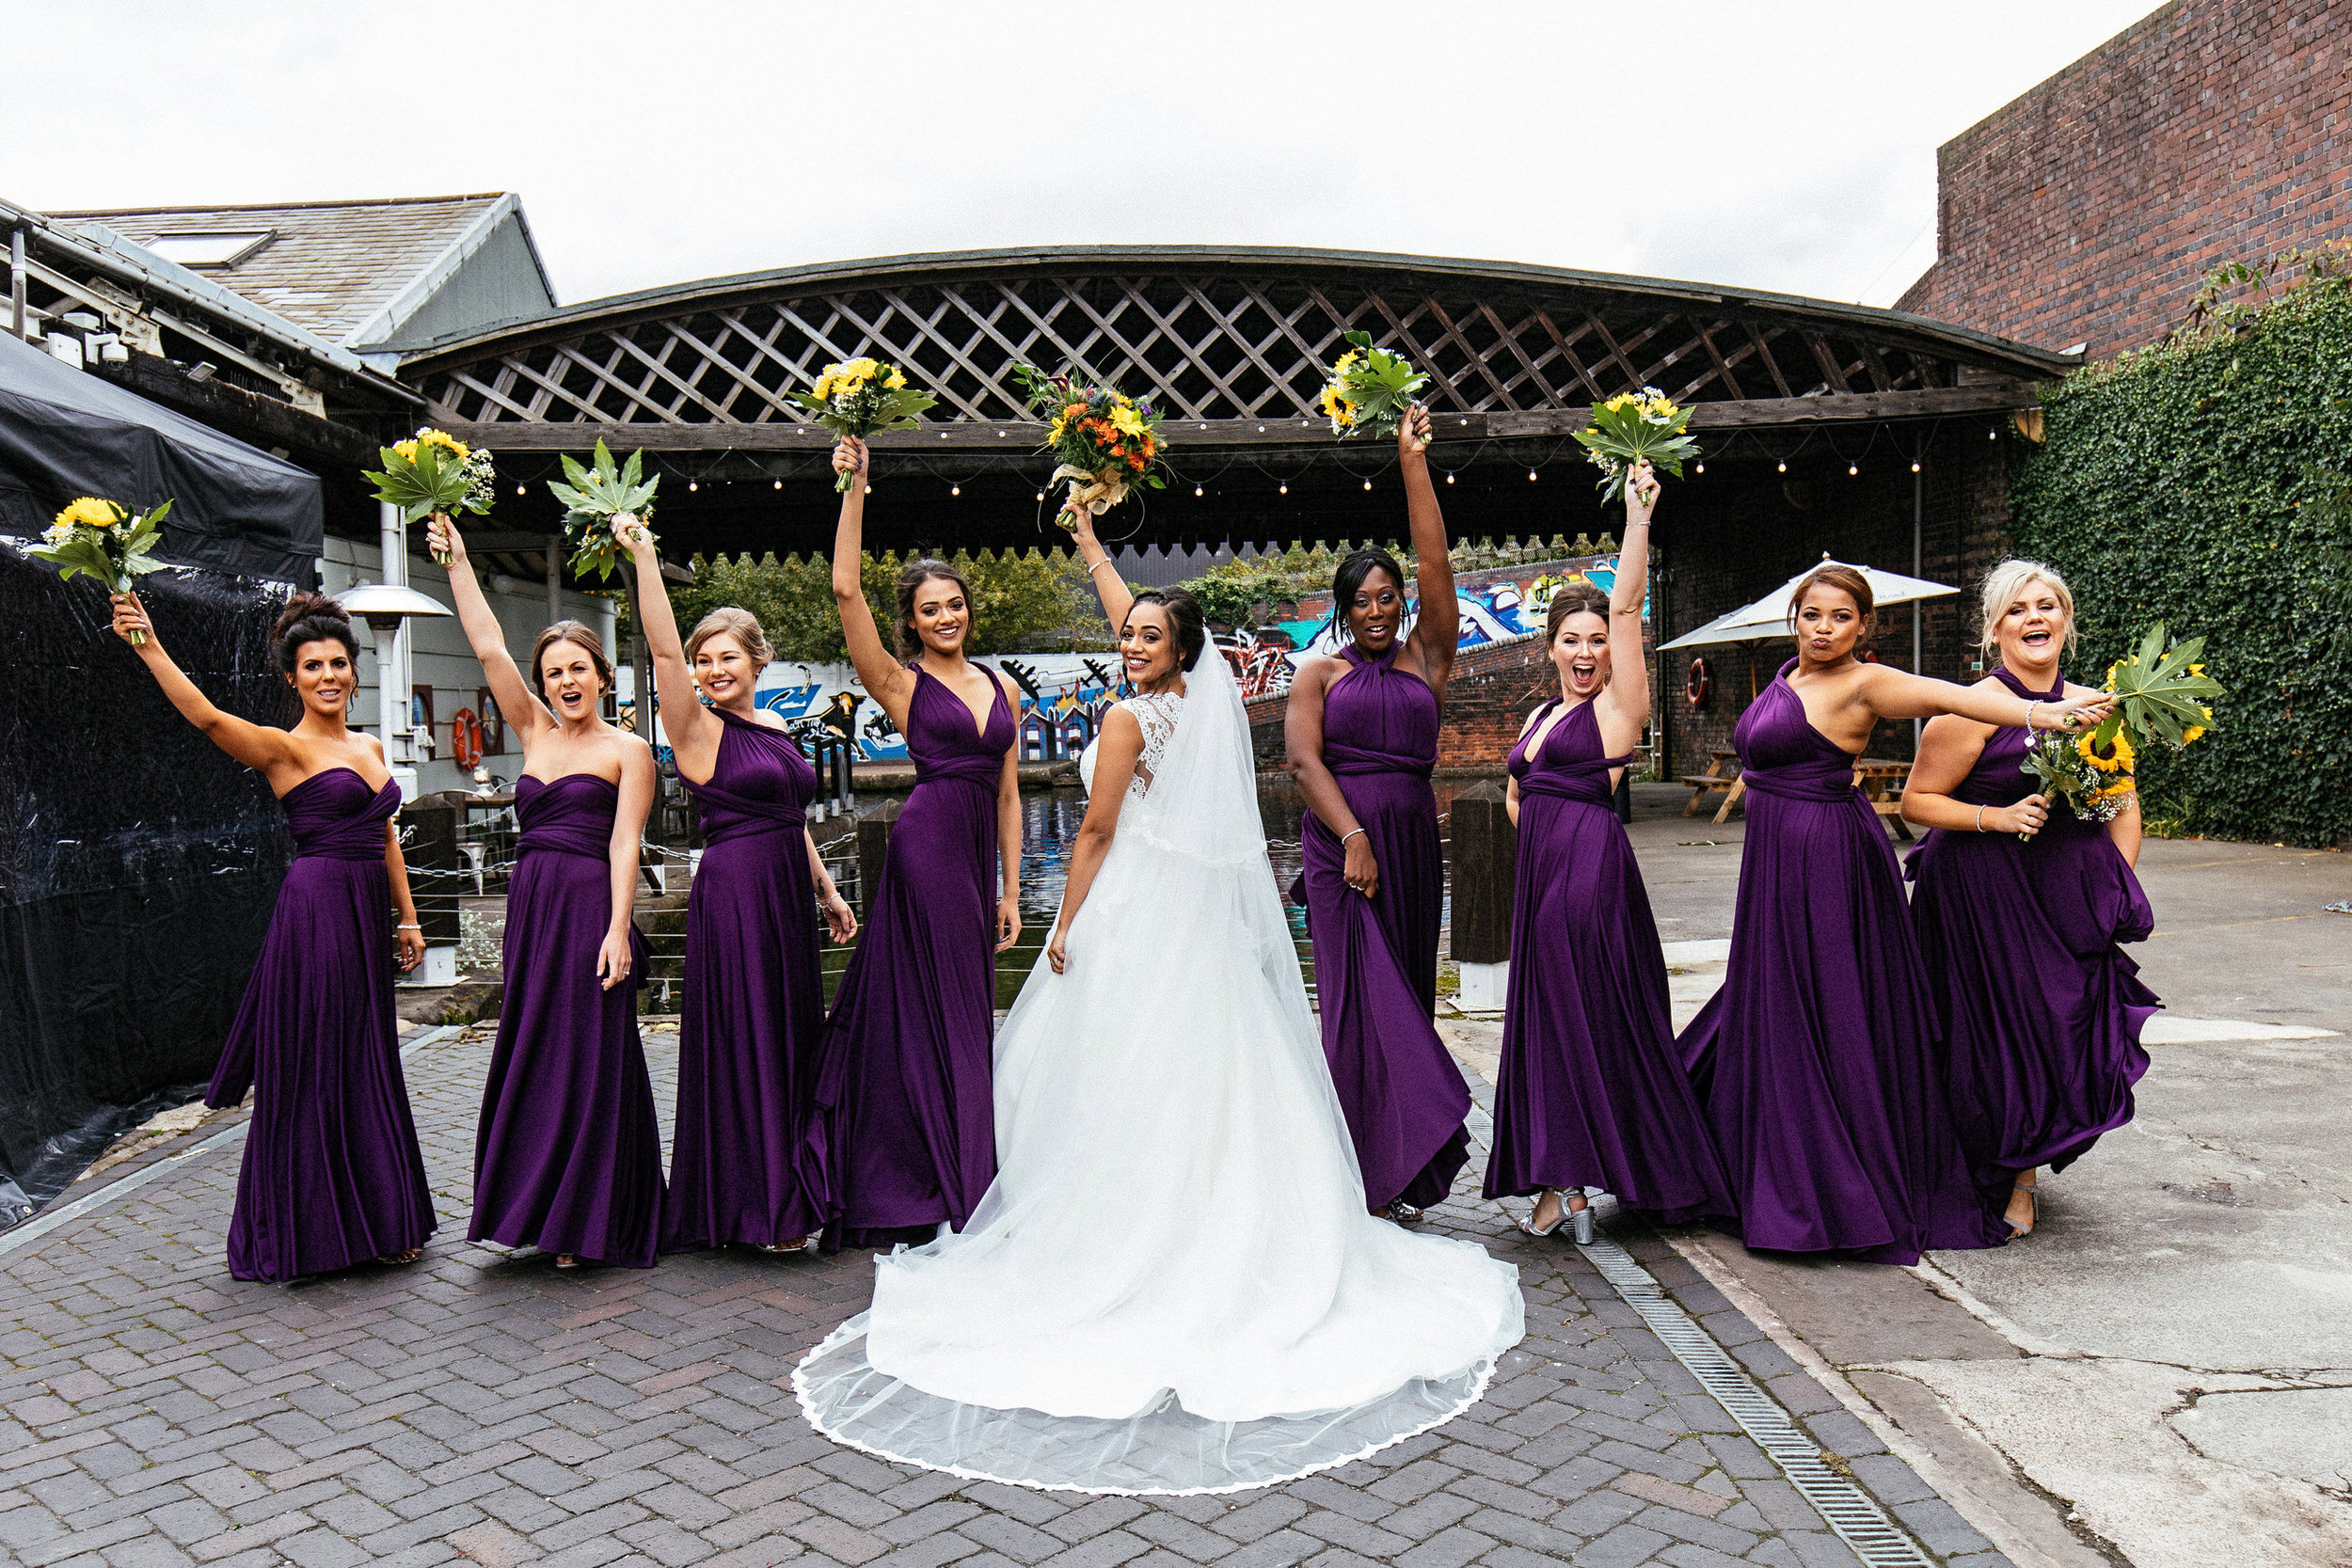 The-Bond-Company-Wedding-Photography-58-1.jpg